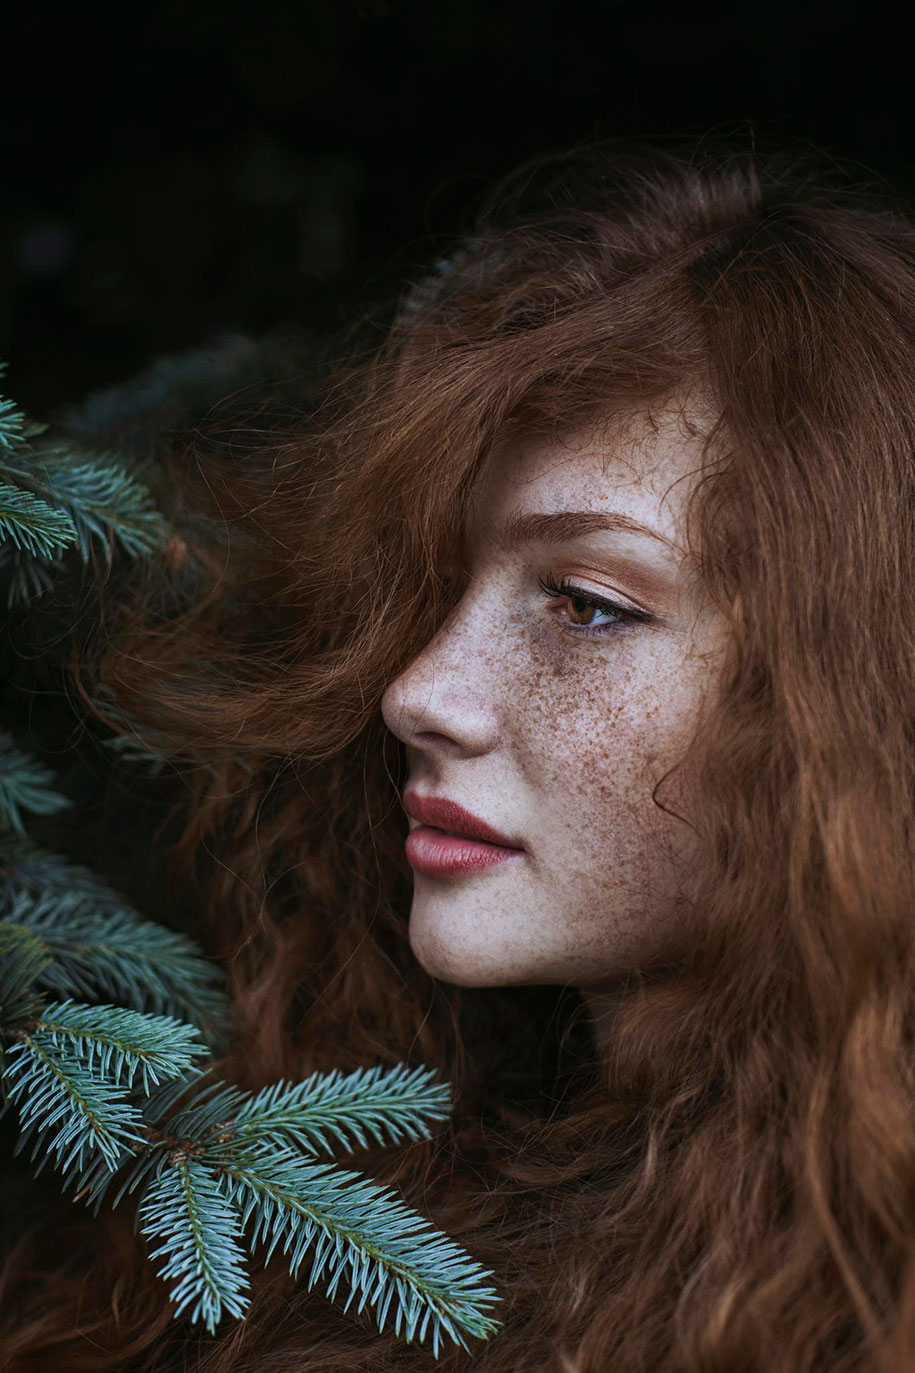 redhead-women-portraits-maja-topcagic-bosnia-herzegovina-6